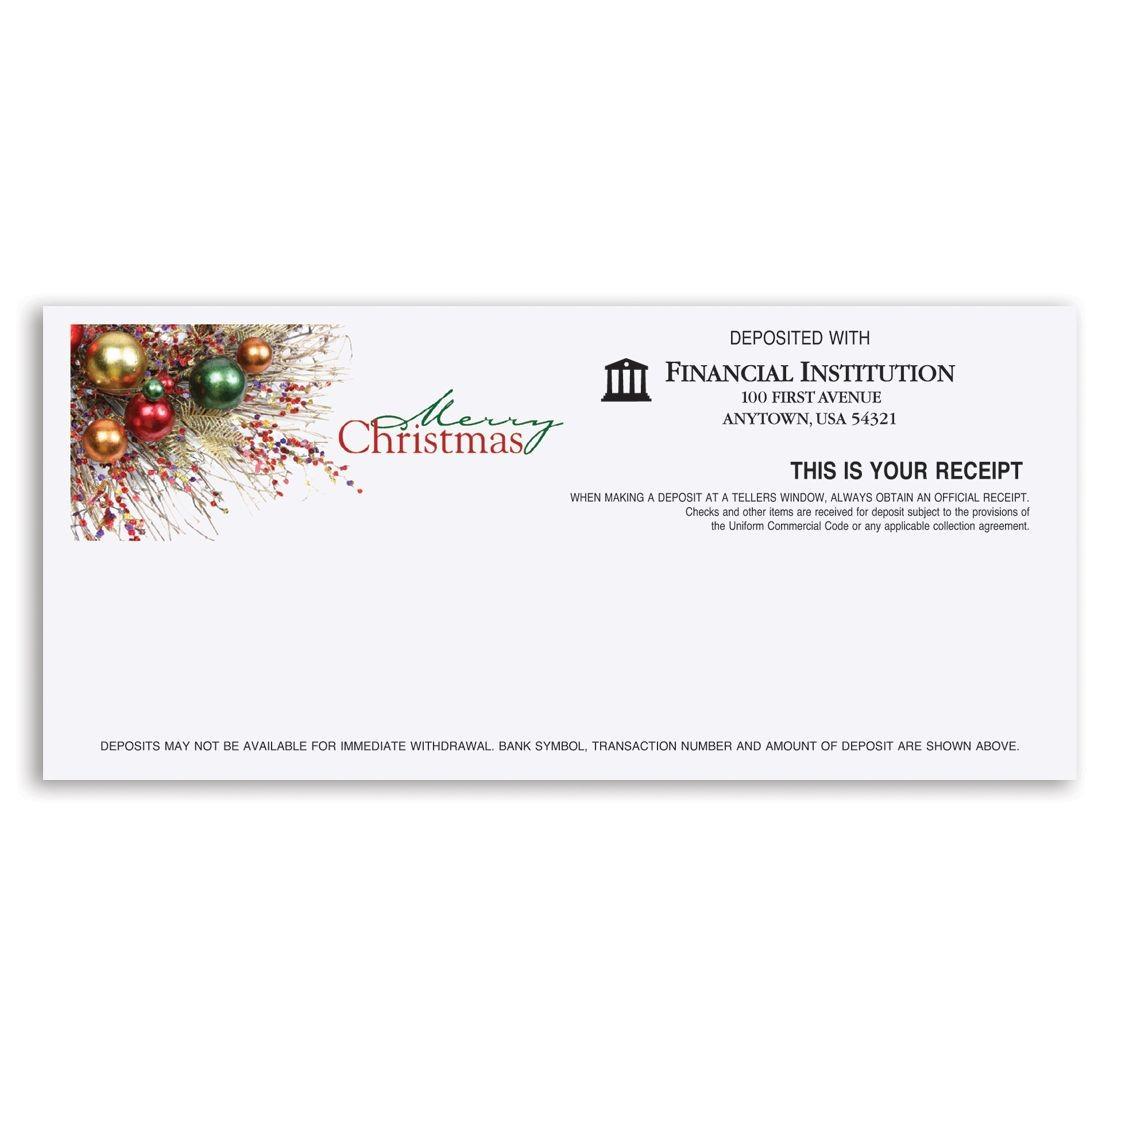 Merry Christmas Teller Receipt